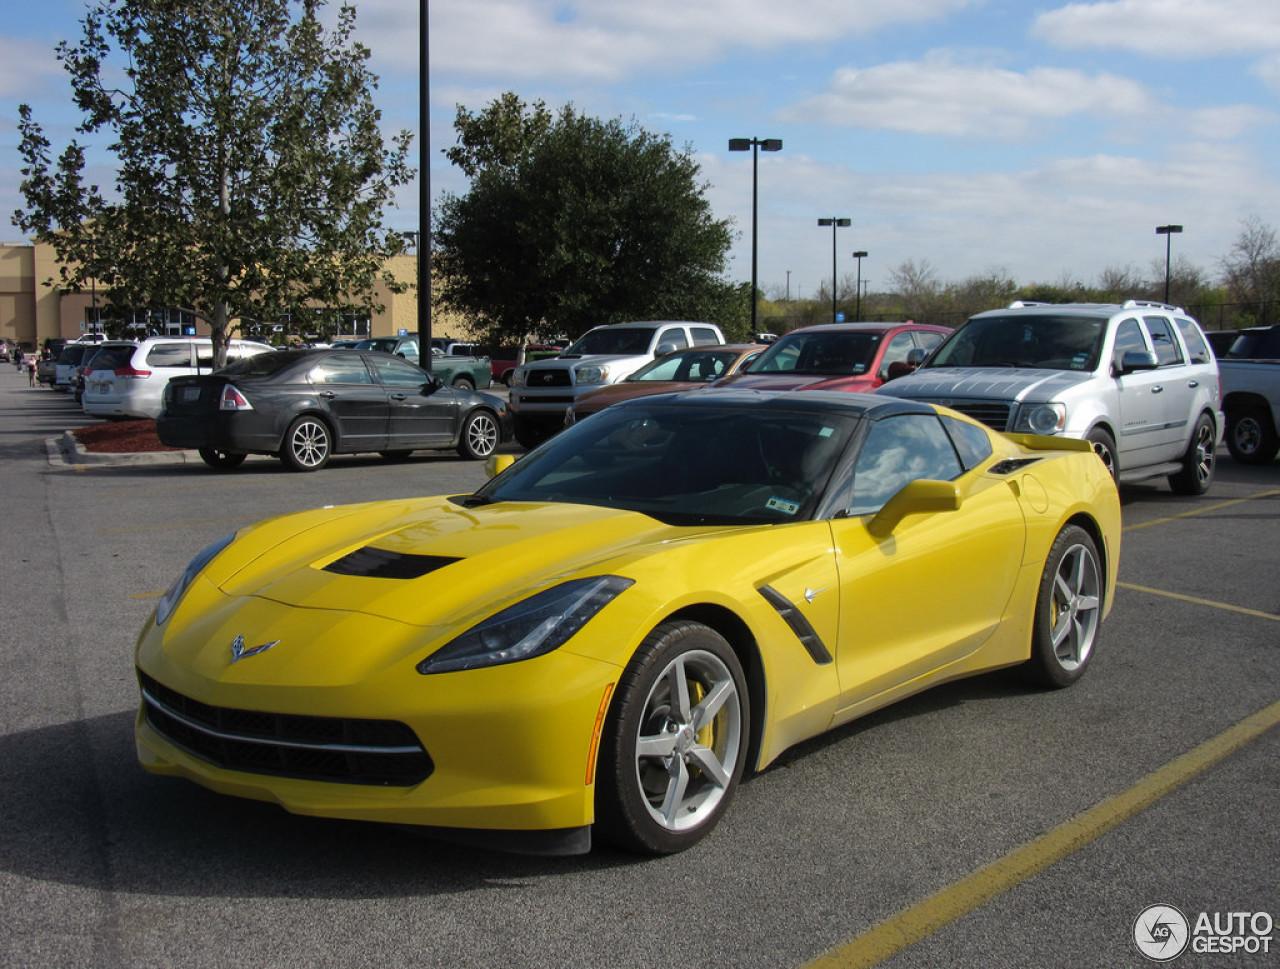 Corvettes For Sale Carmax >> Corvette Stingray 2014 For Sale In Tx | Autos Post